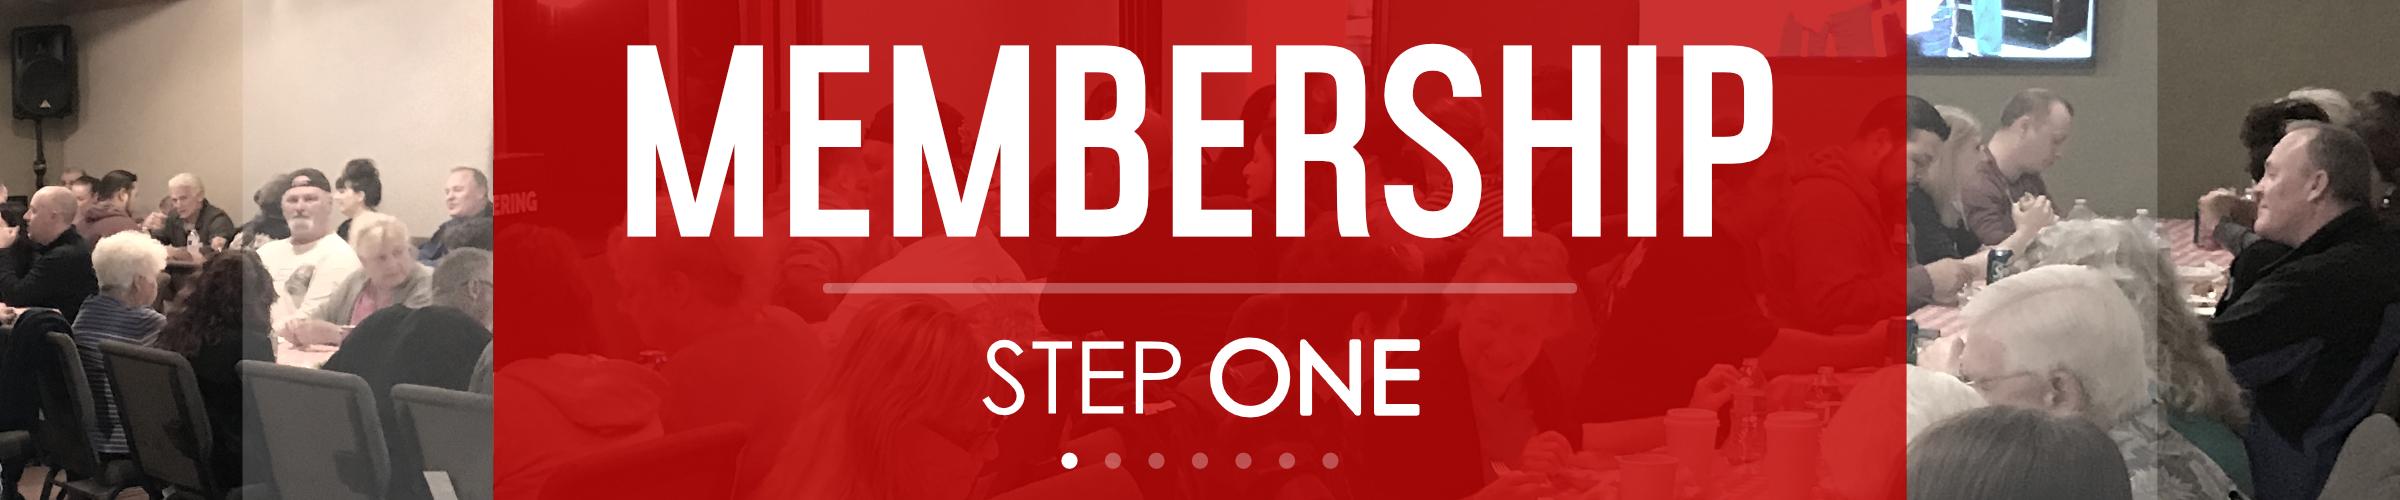 Membership - Step One.jpg